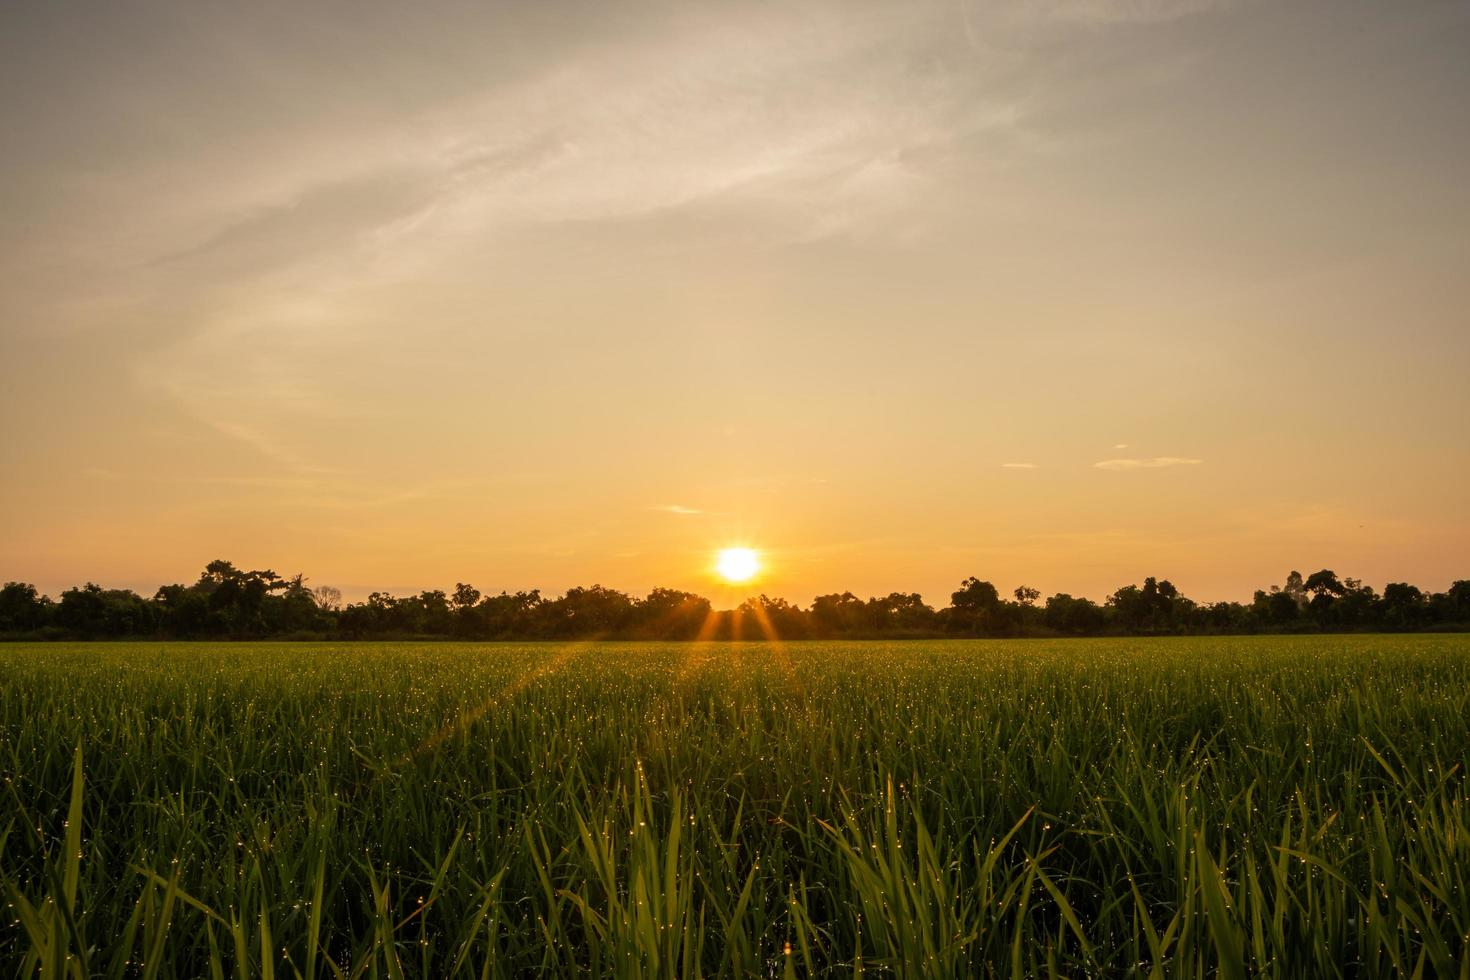 Sunrise in rice field photo